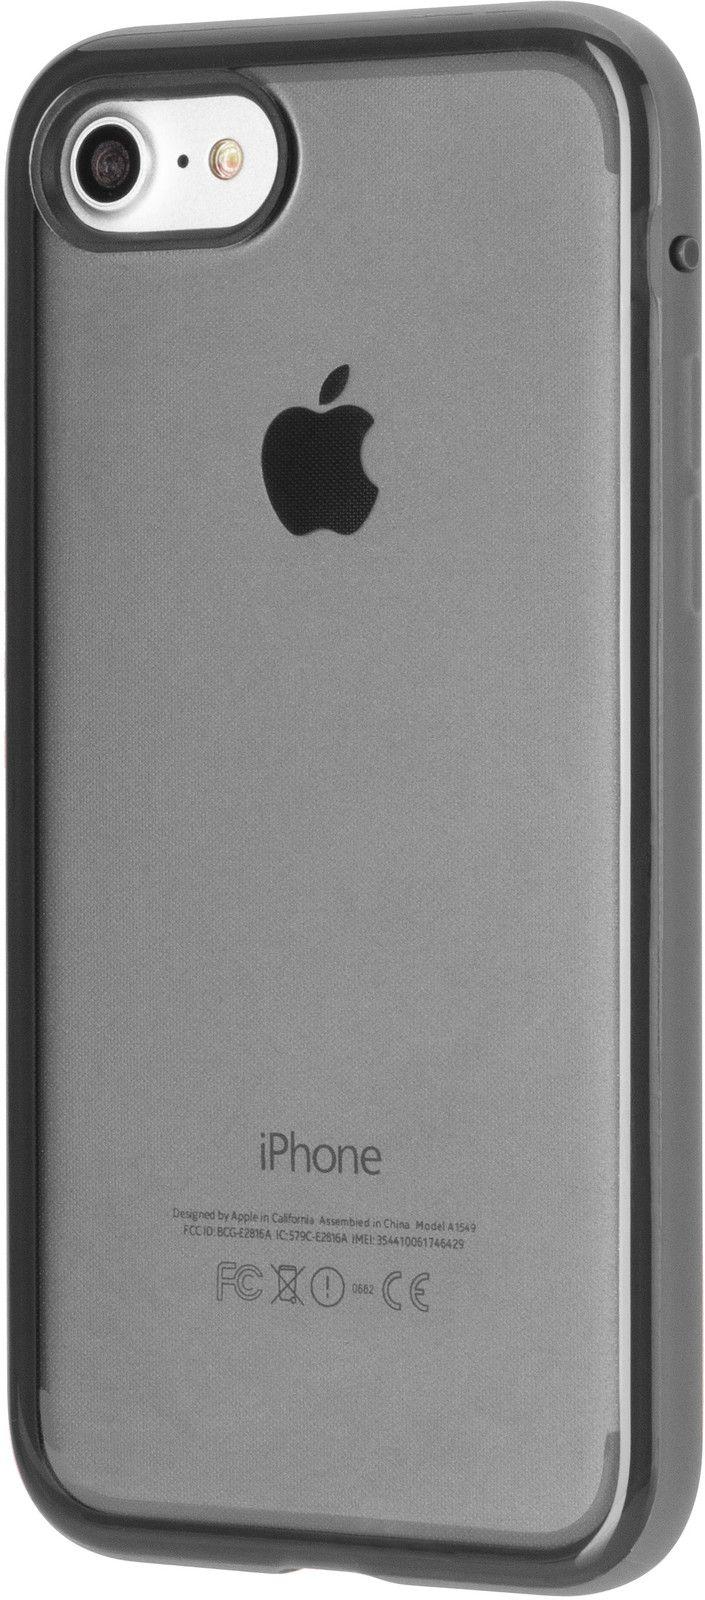 Xqisit Nuson Xcel (iPhone 7) – Vit